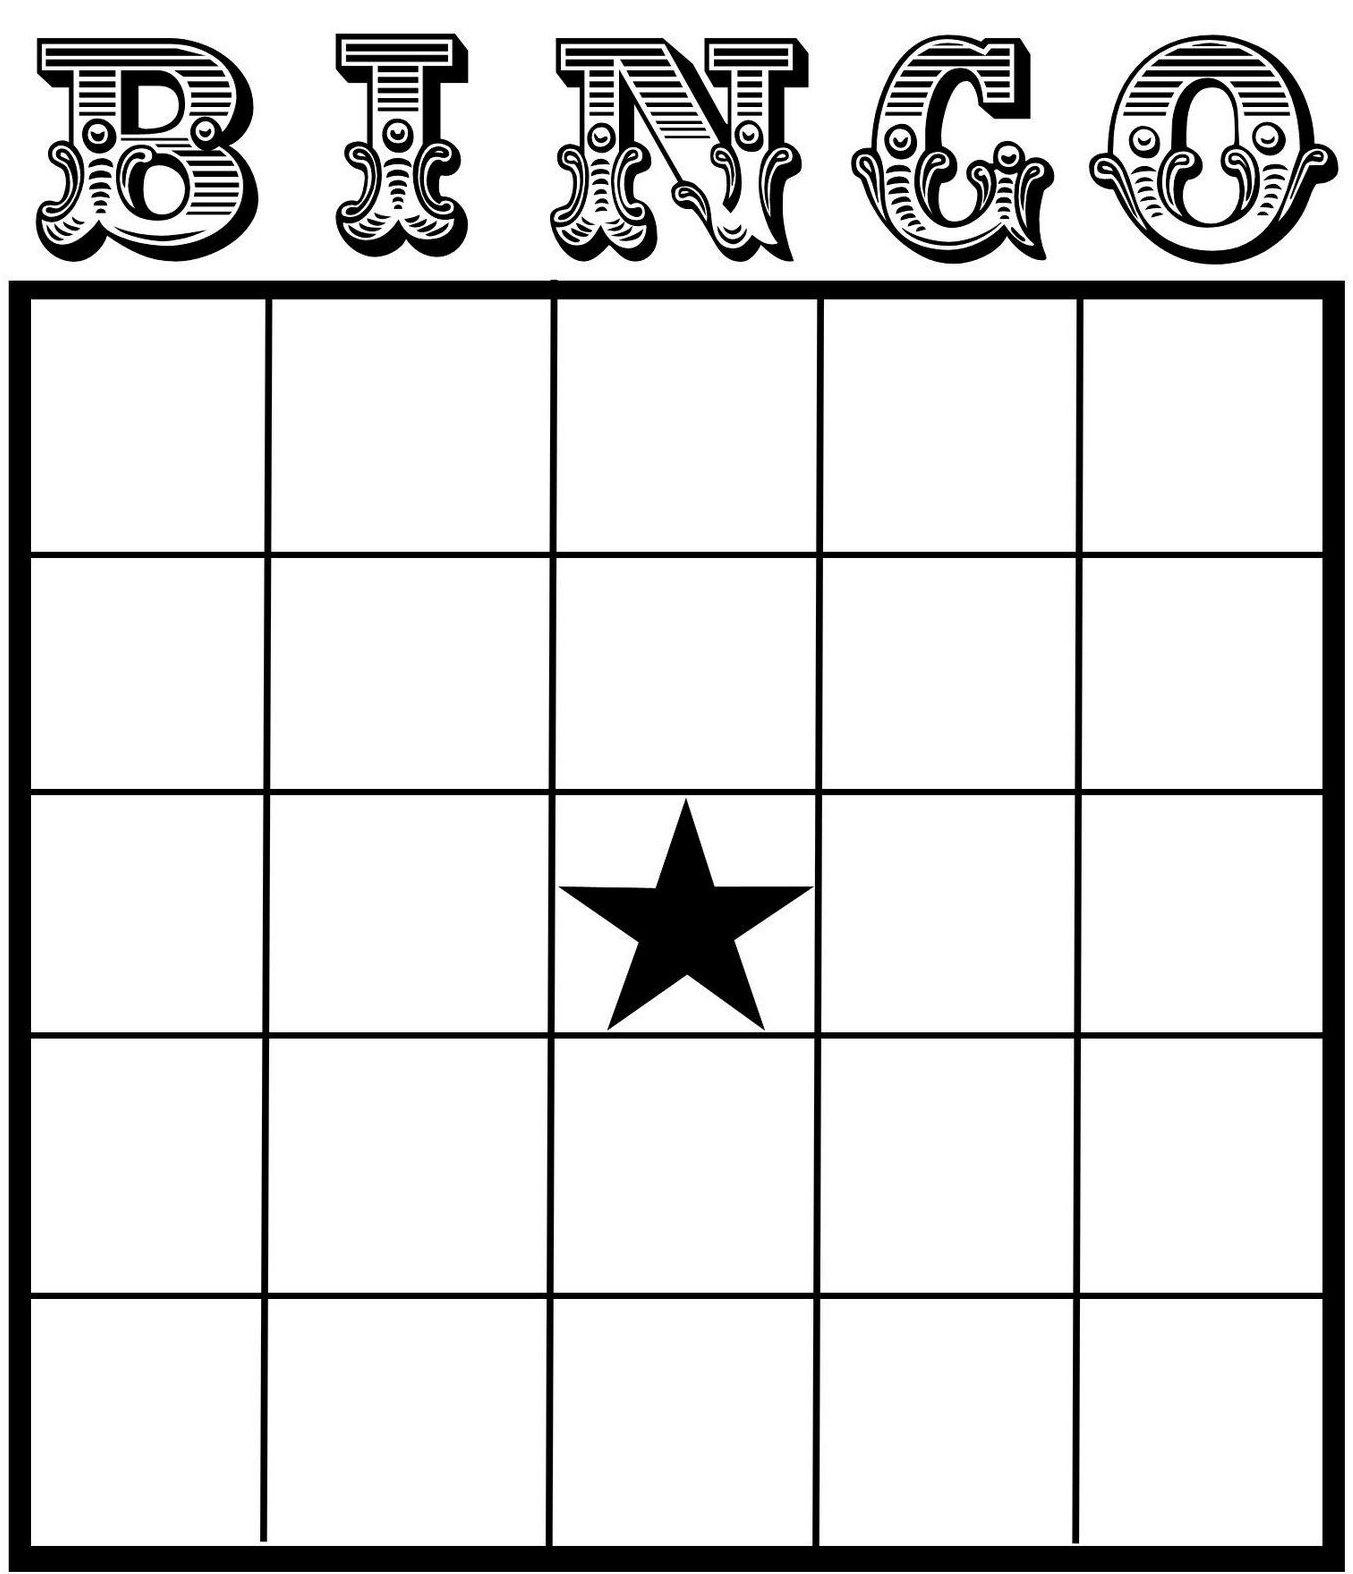 002 Blank Bingo Card Template Ideas Stupendous Free Baby Shower - Bingo Generator Free Printable